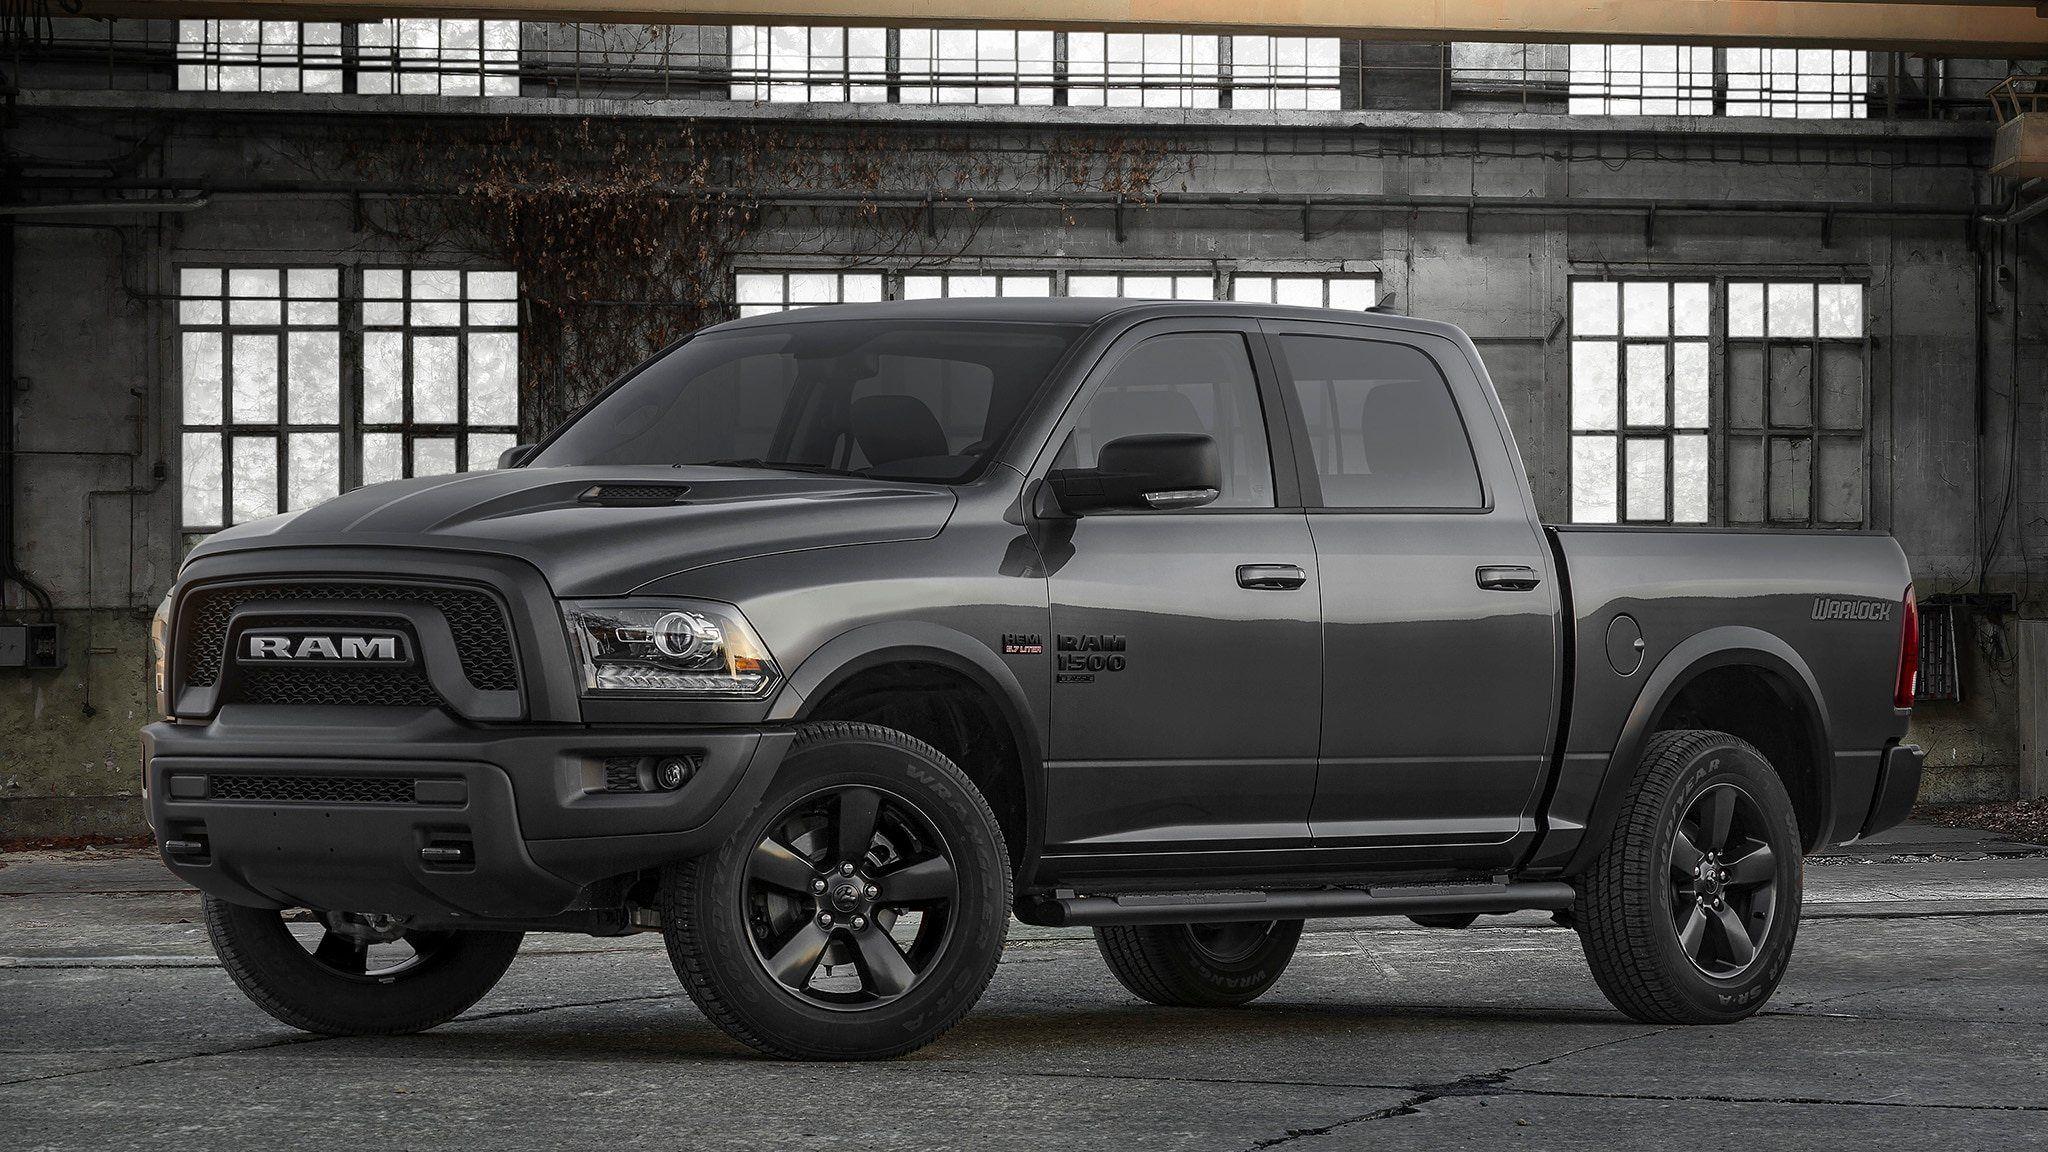 2021 Dodge Ram Truck Redesign And Concept In 2020 Ram 1500 Ram Trucks Dodge Ram 1500